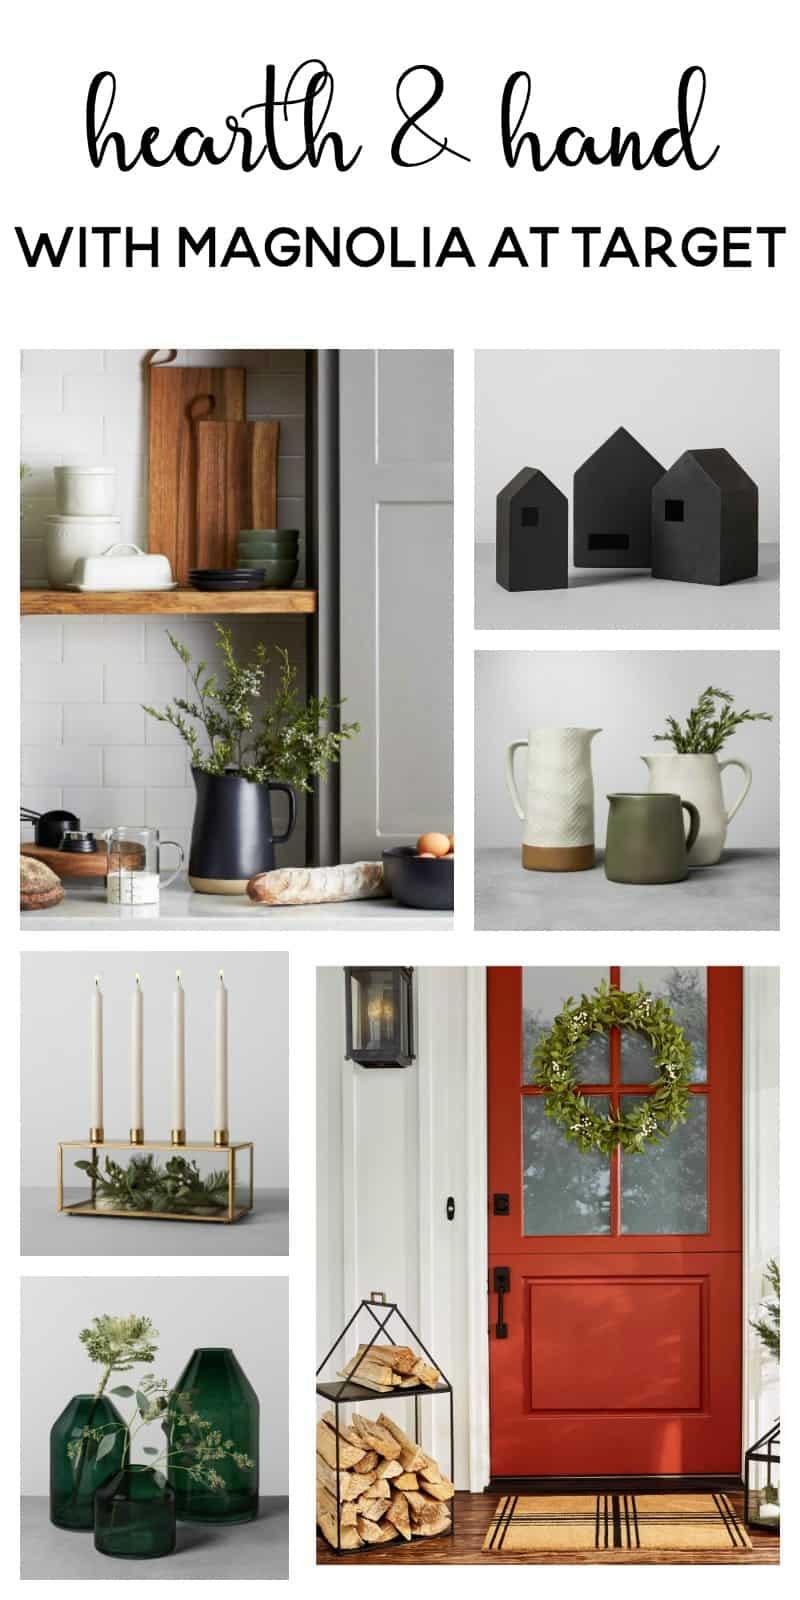 hearth & hand by magnolia at target | farmhouse decor | modern farmhouse | joanna gaines | magnolia market